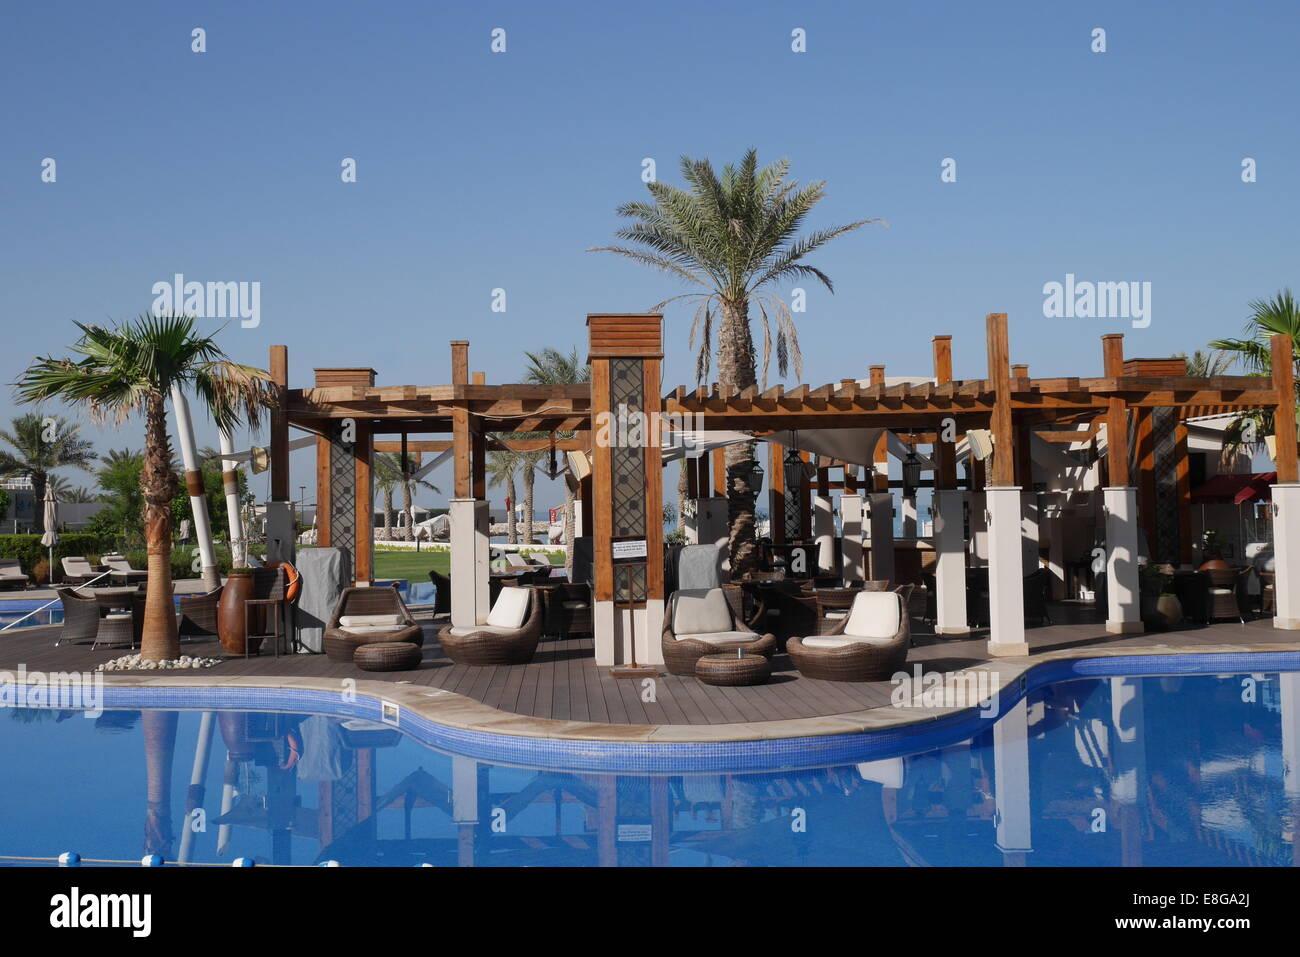 Pool bar stock photos pool bar stock images alamy - Jumeirah beach hotel swimming pool ...